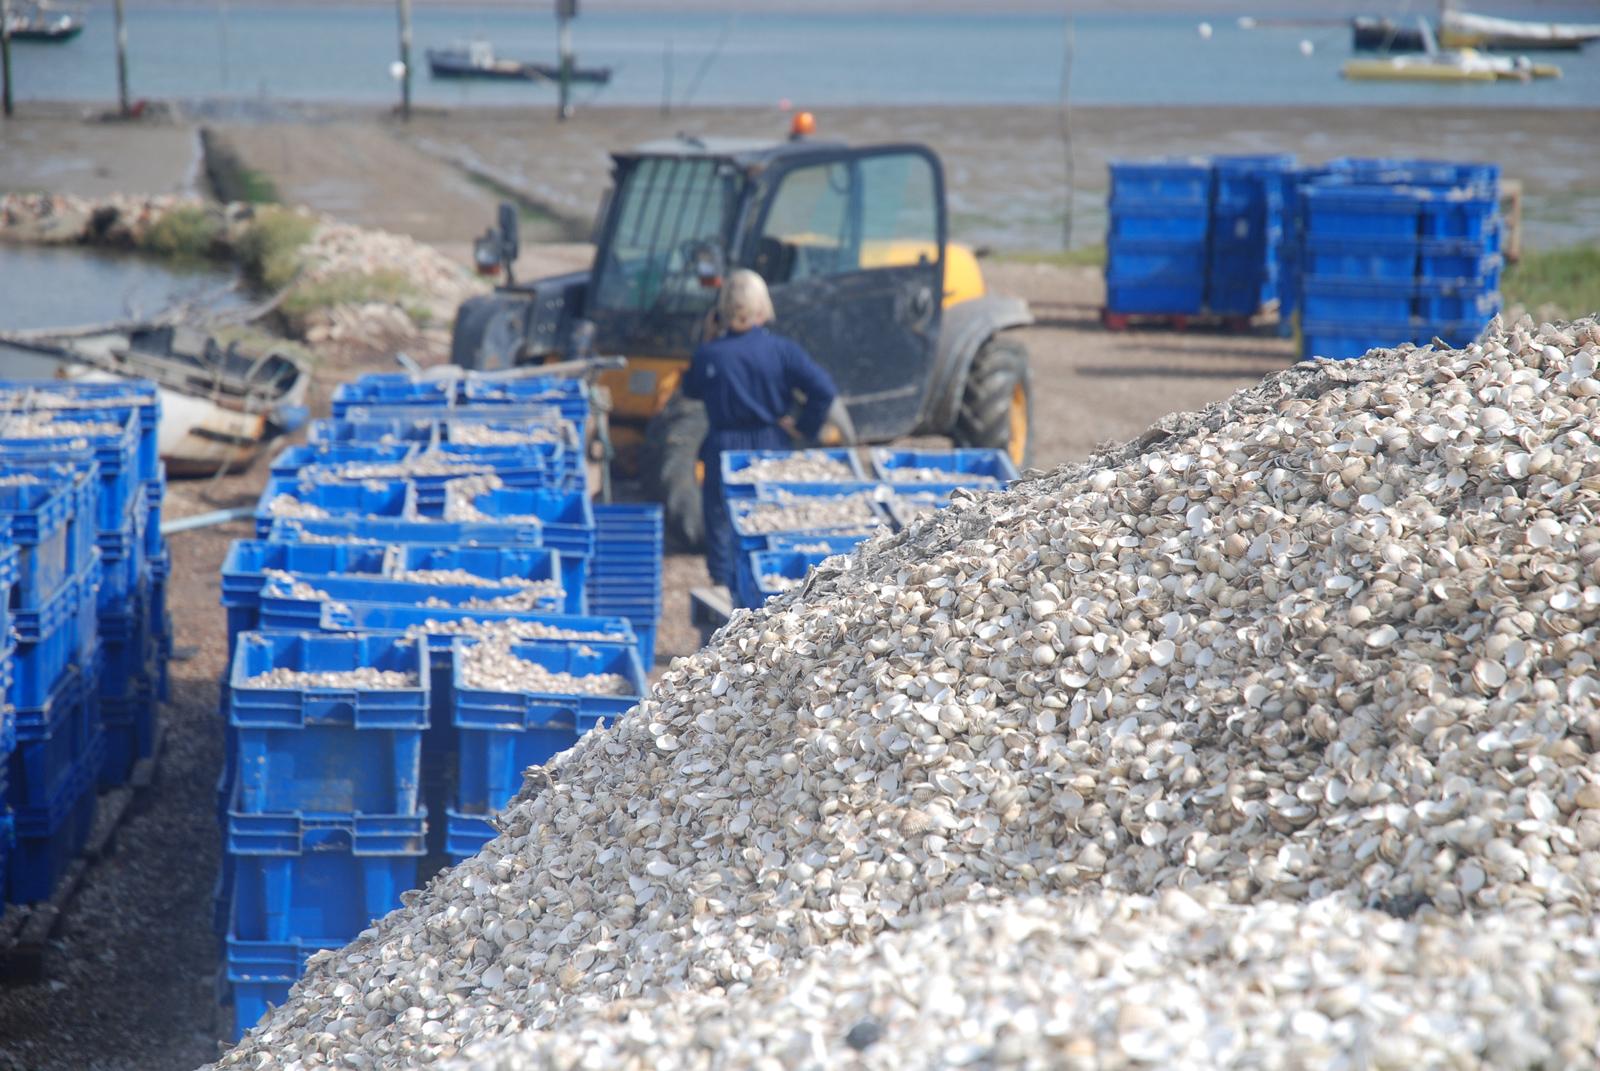 Shellcrete: Transforming Sea Shells Into Low-Carbon Materials